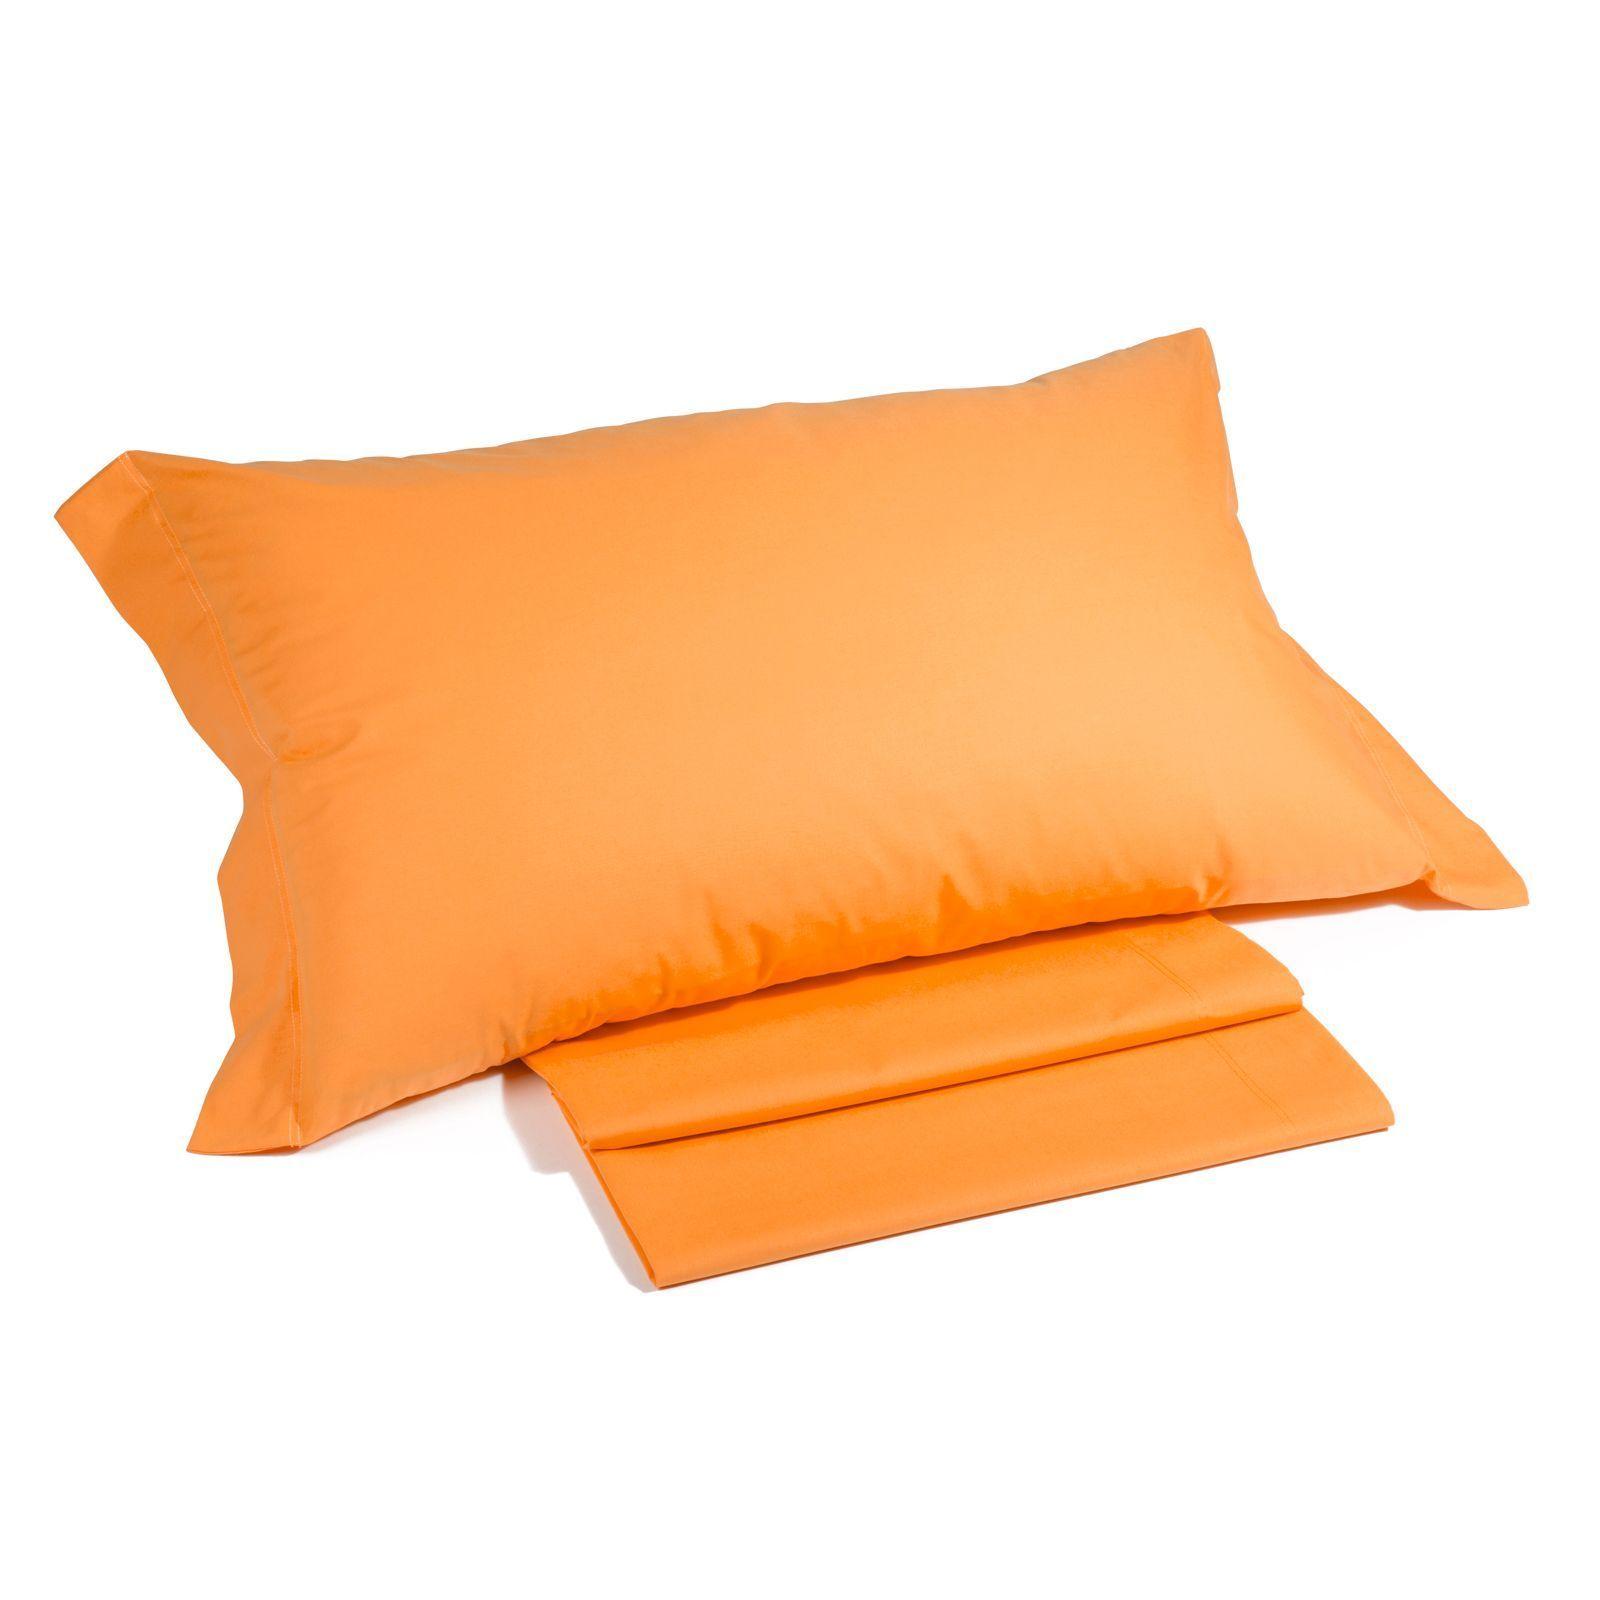 Наволочки для сна Наволочки 2шт 50х70 Caleffi Tinta Unita оранжевые elitnye-navolochki-hlopkovye-unita-oranzhevye-ot-caleffi-italiya.jpg